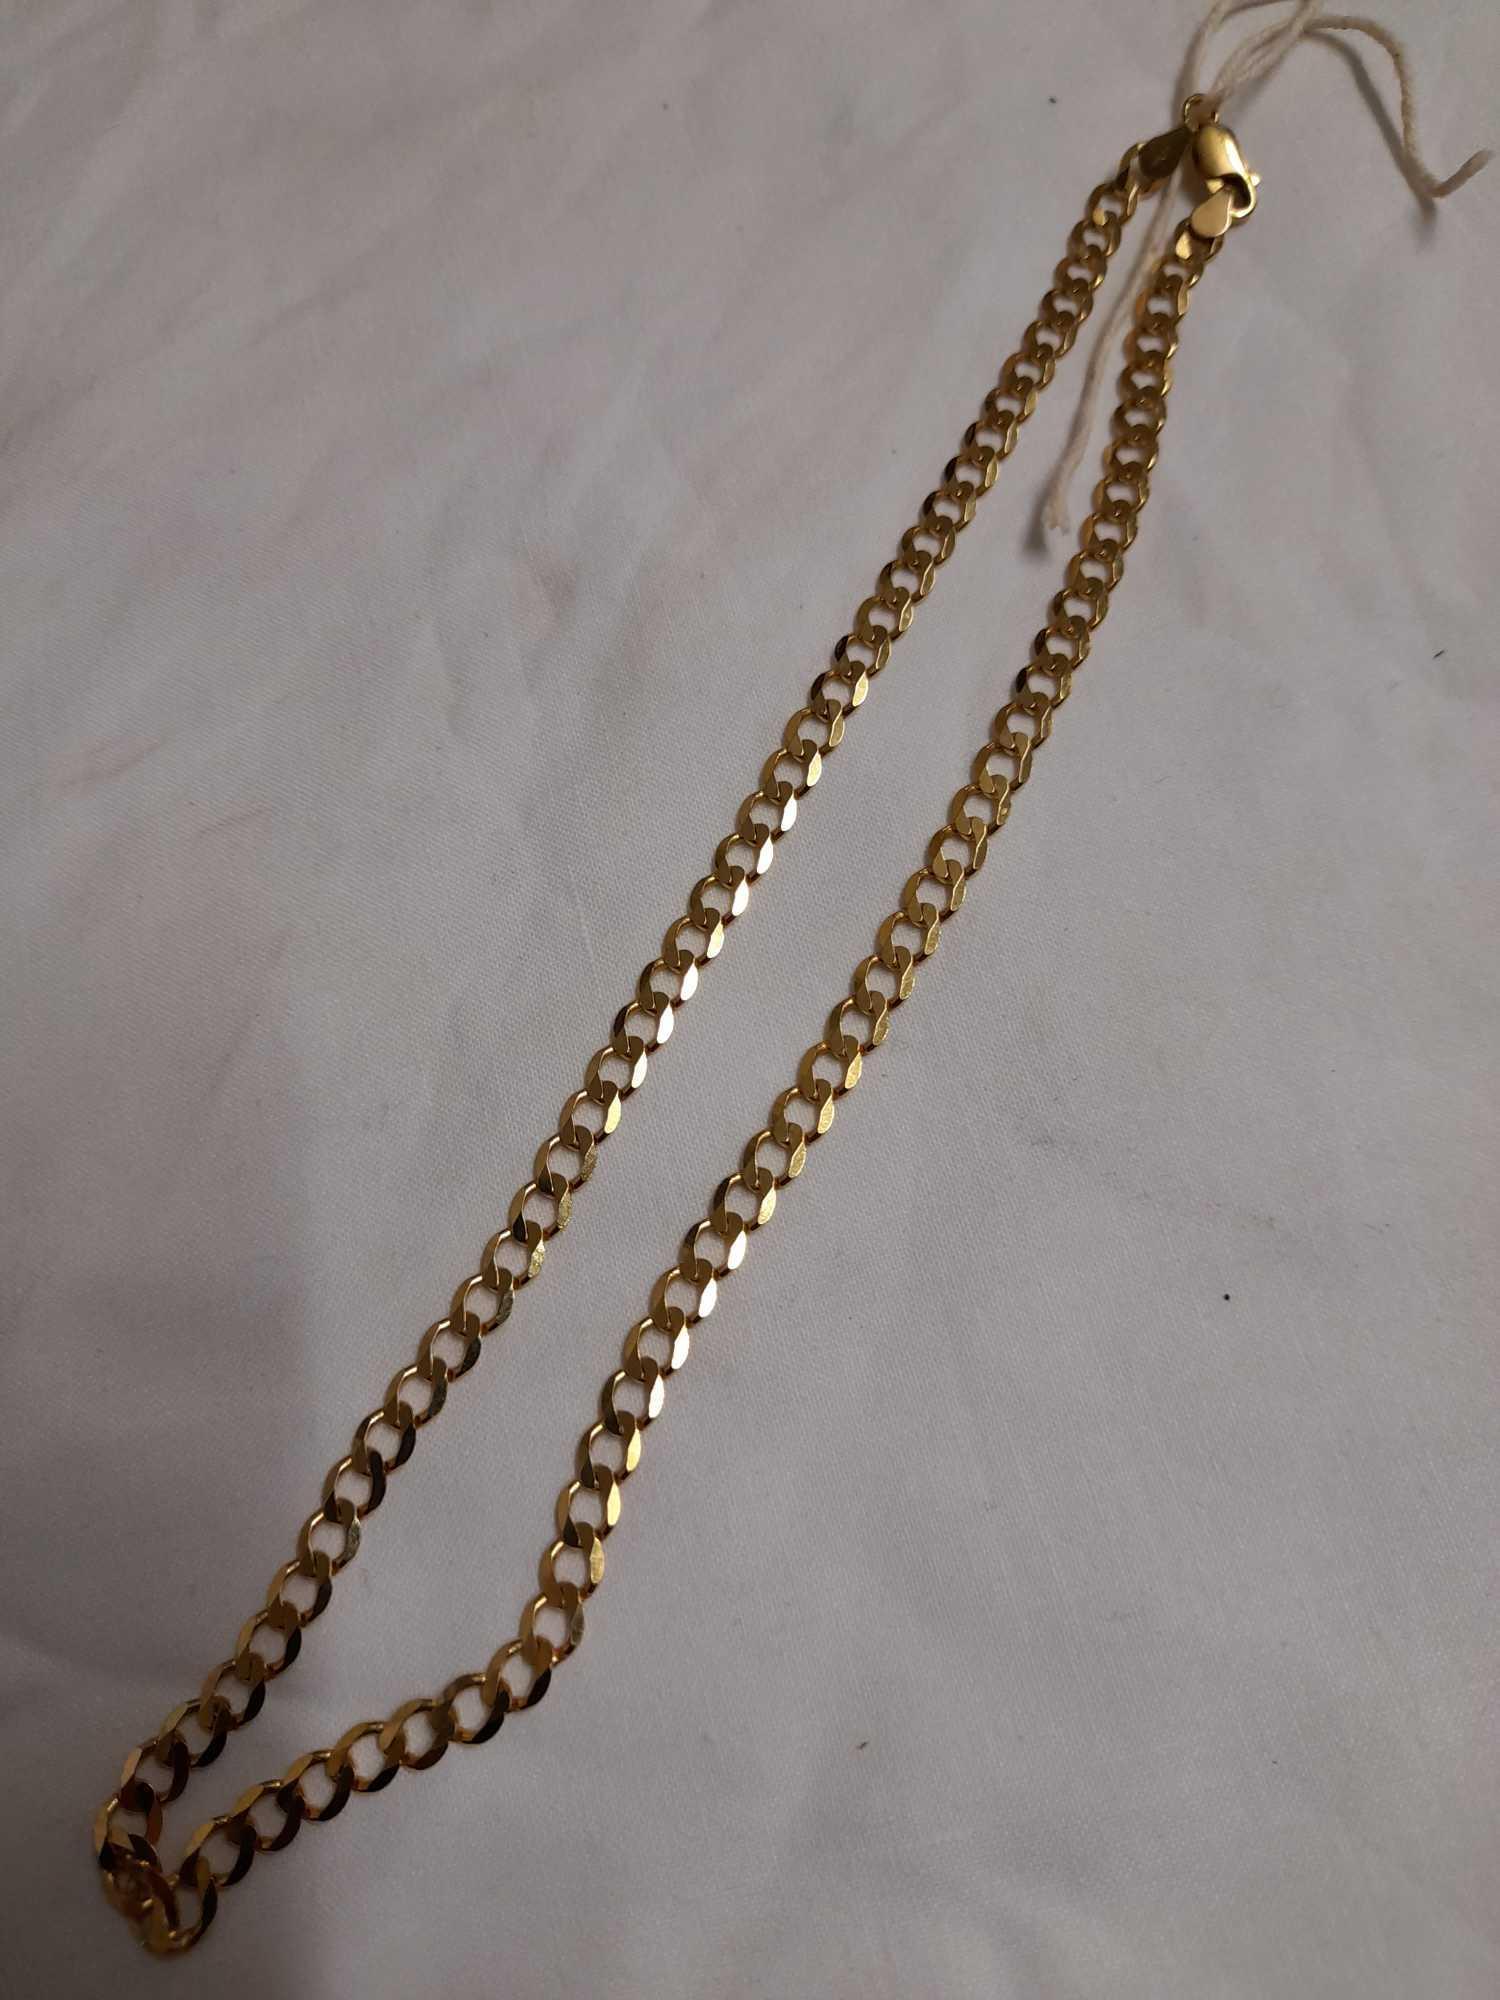 GOLD CHAIN 9 G